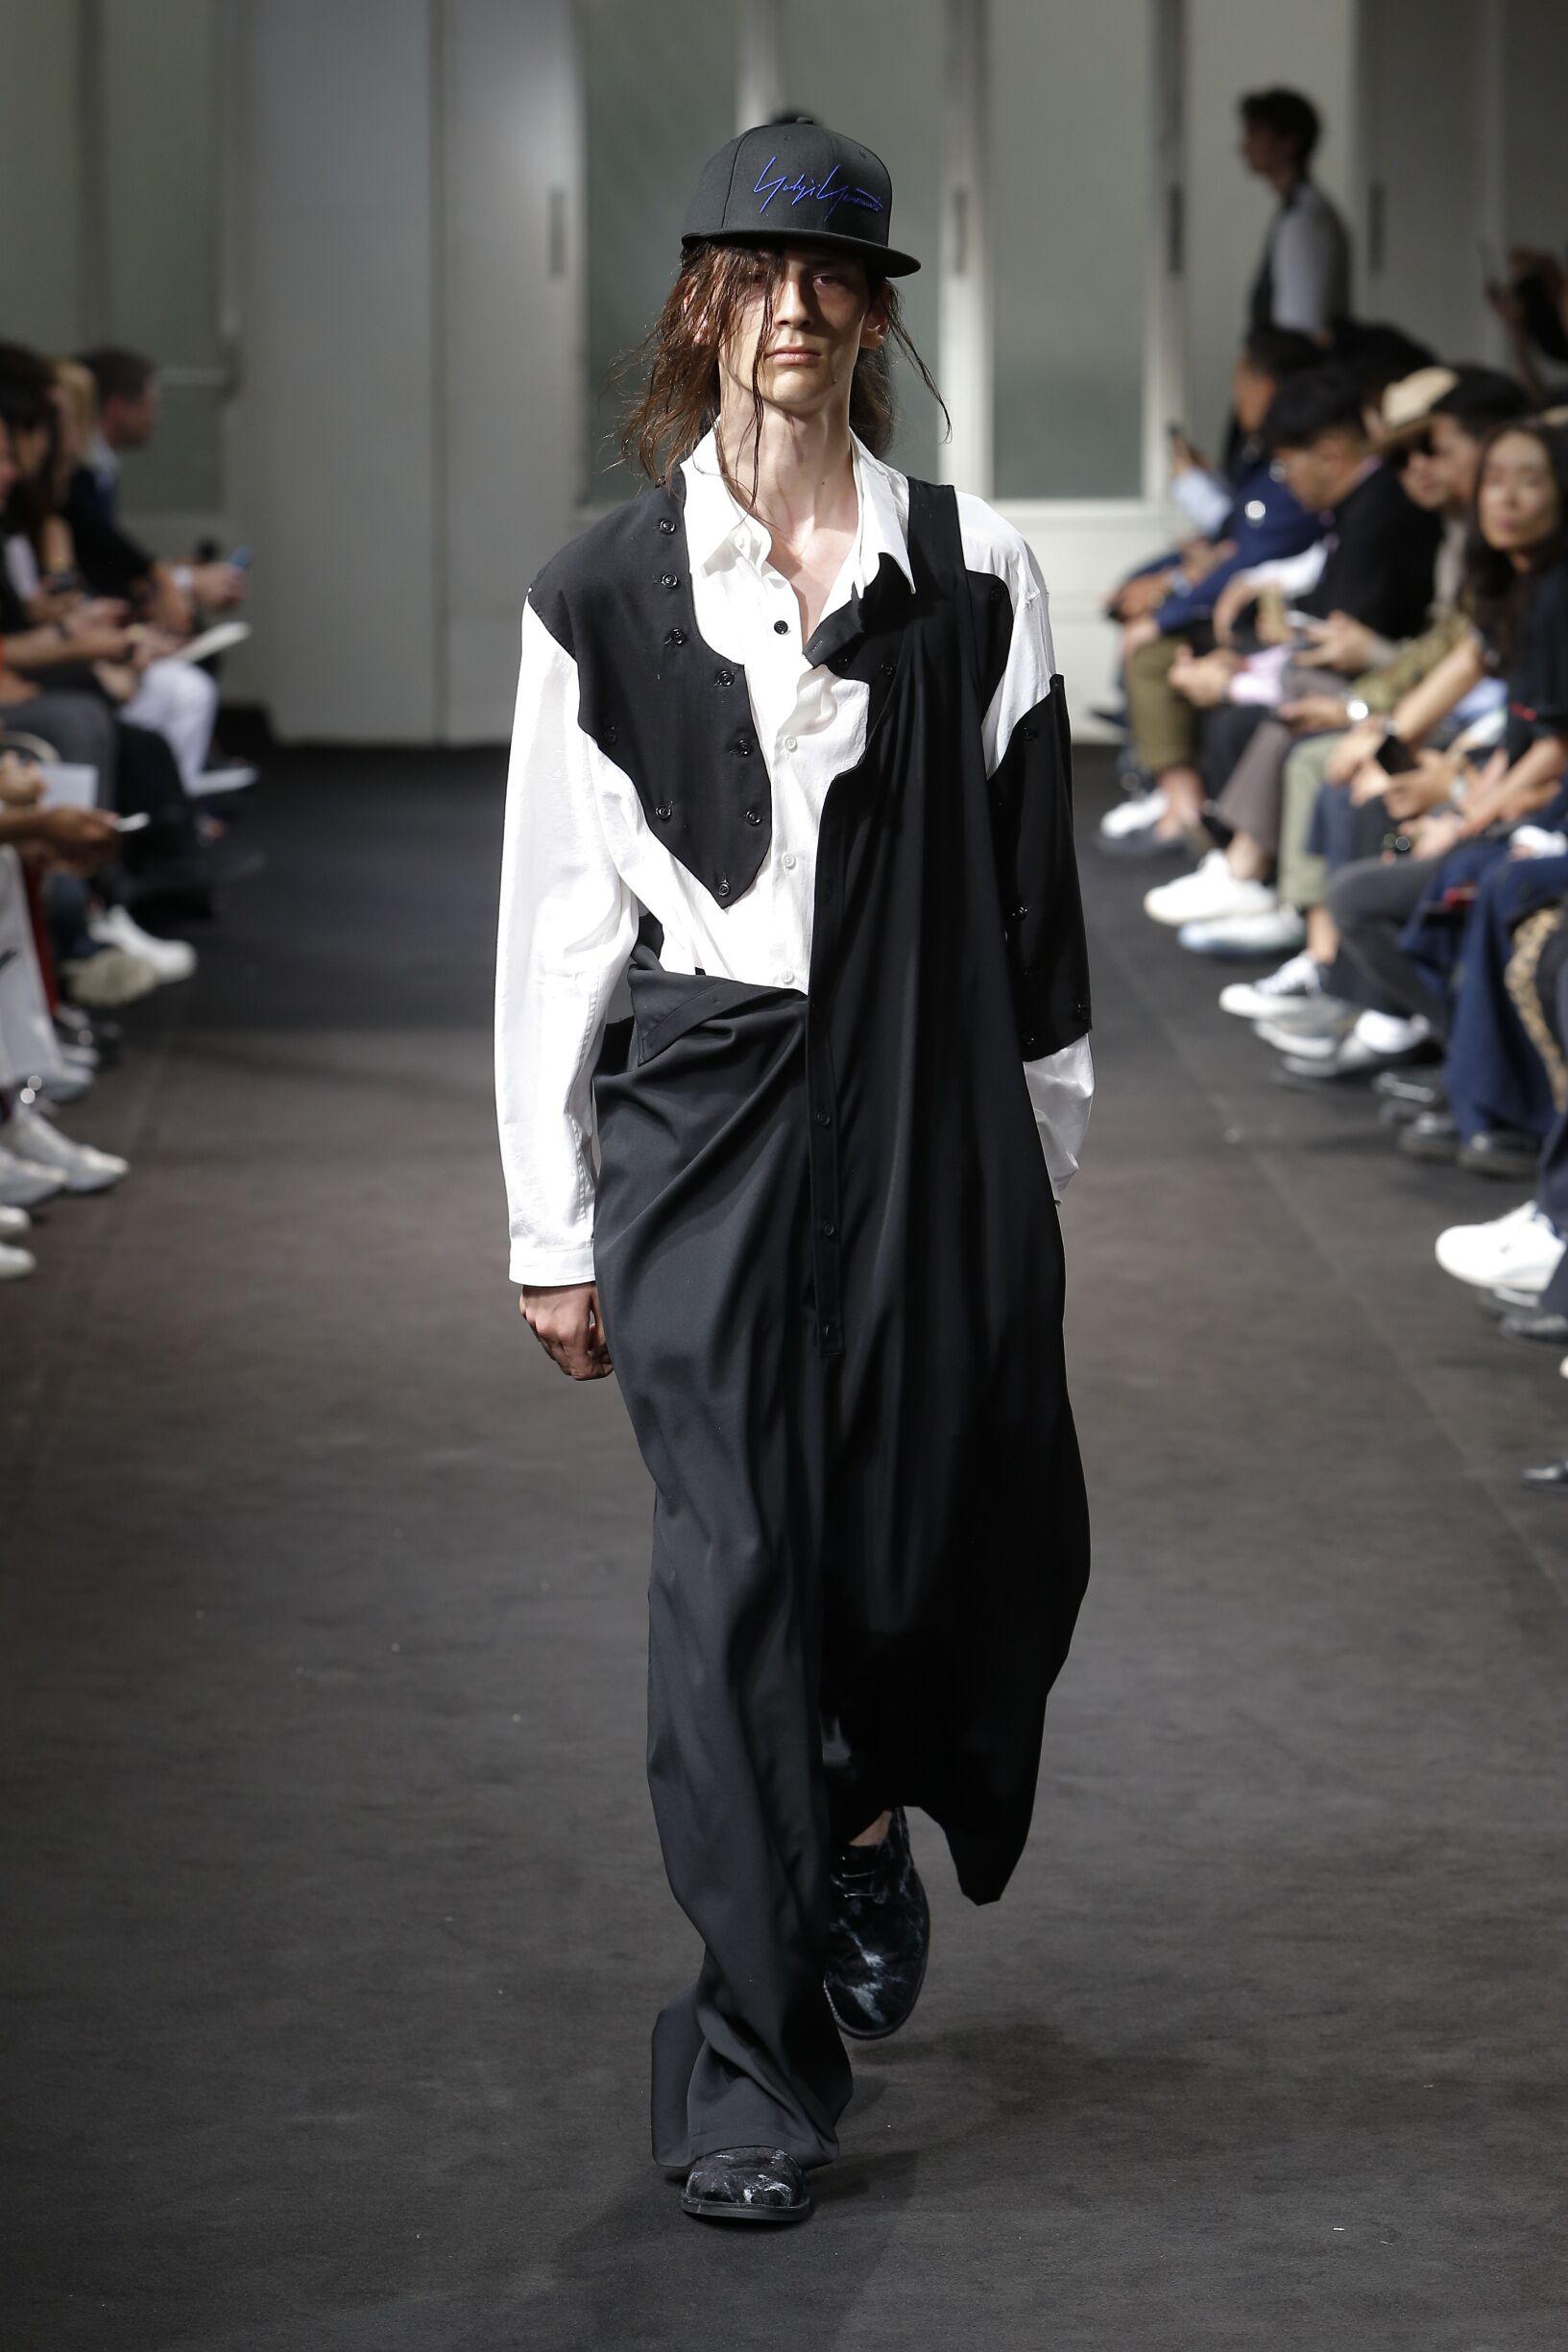 Summer 2019 Man Trends Yohji Yamamoto